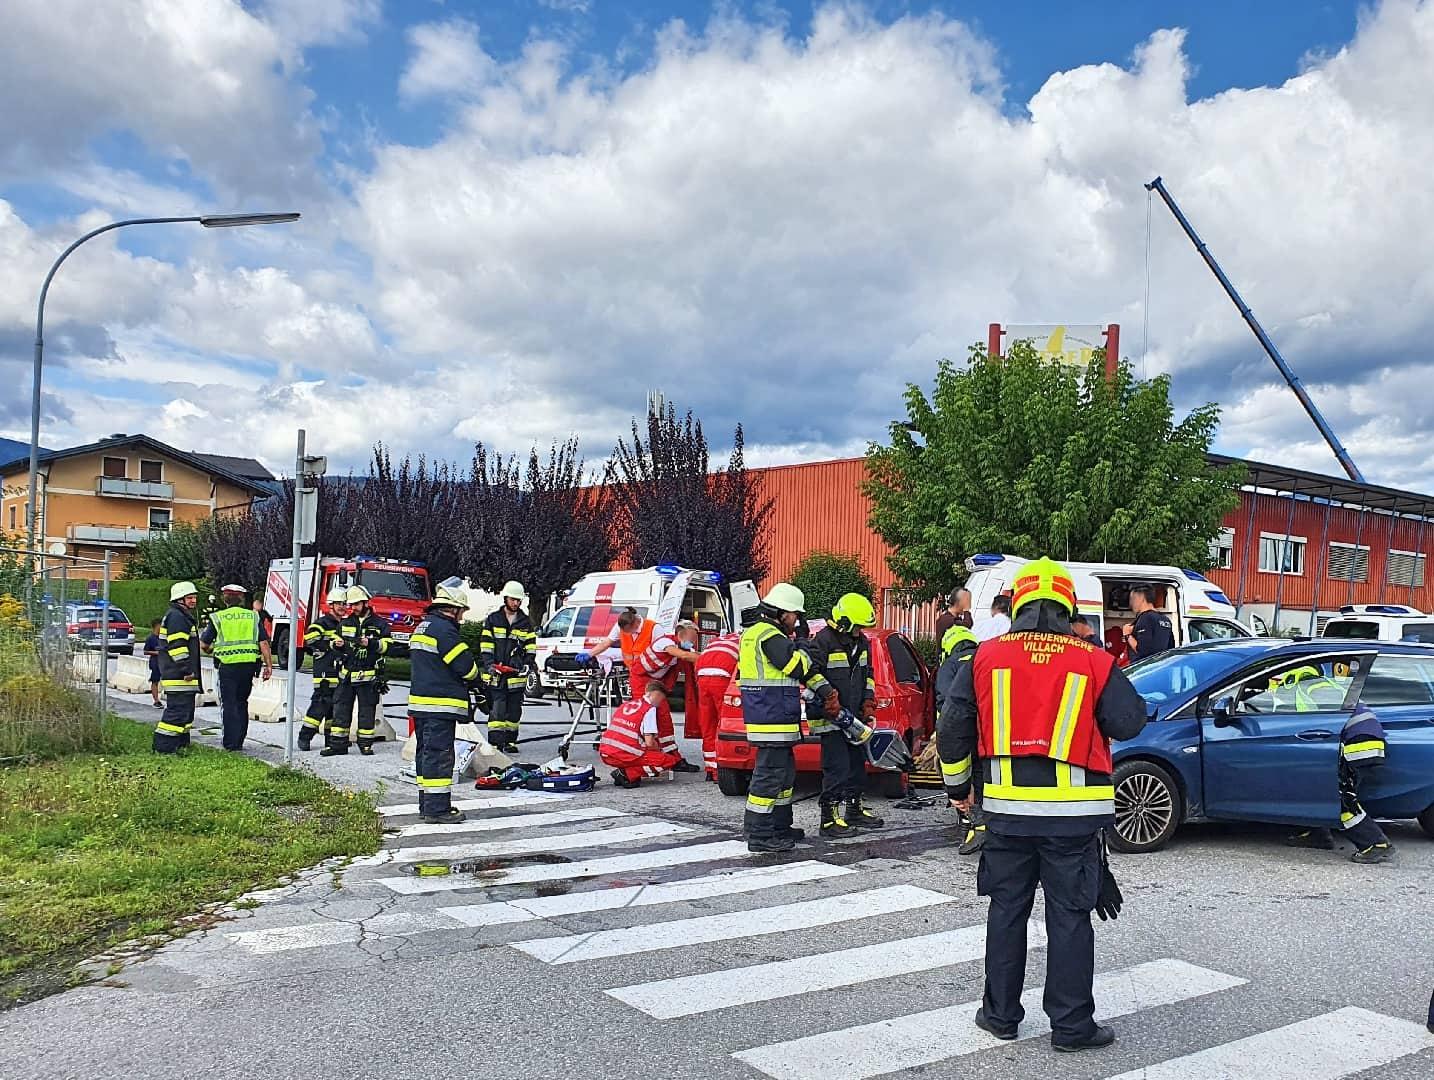 Schwerer Verkehrsunfall mit eingeklemmten Personen